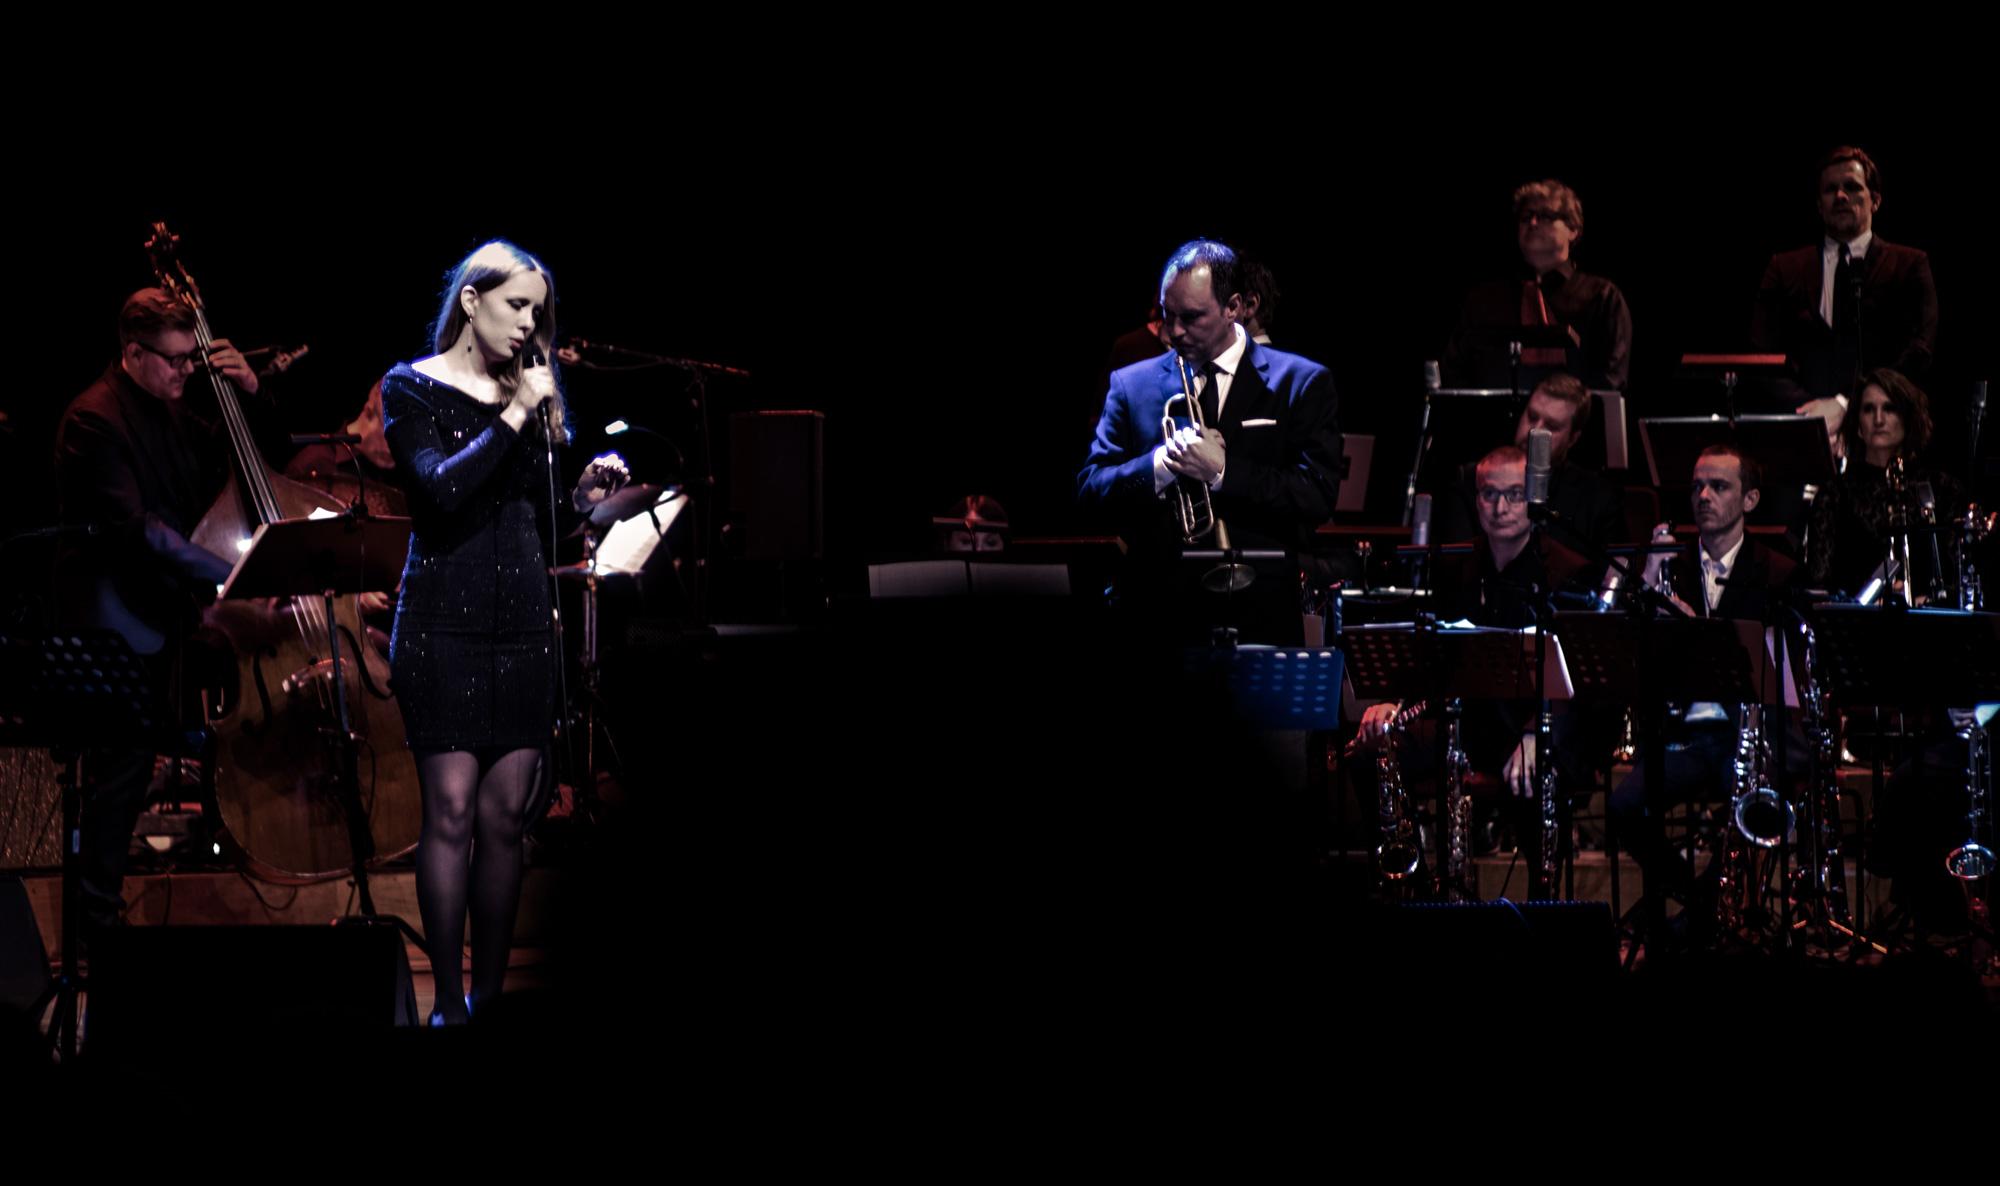 Ellen Andersson BHJO Stockholms konserthus 24 mars.jpg